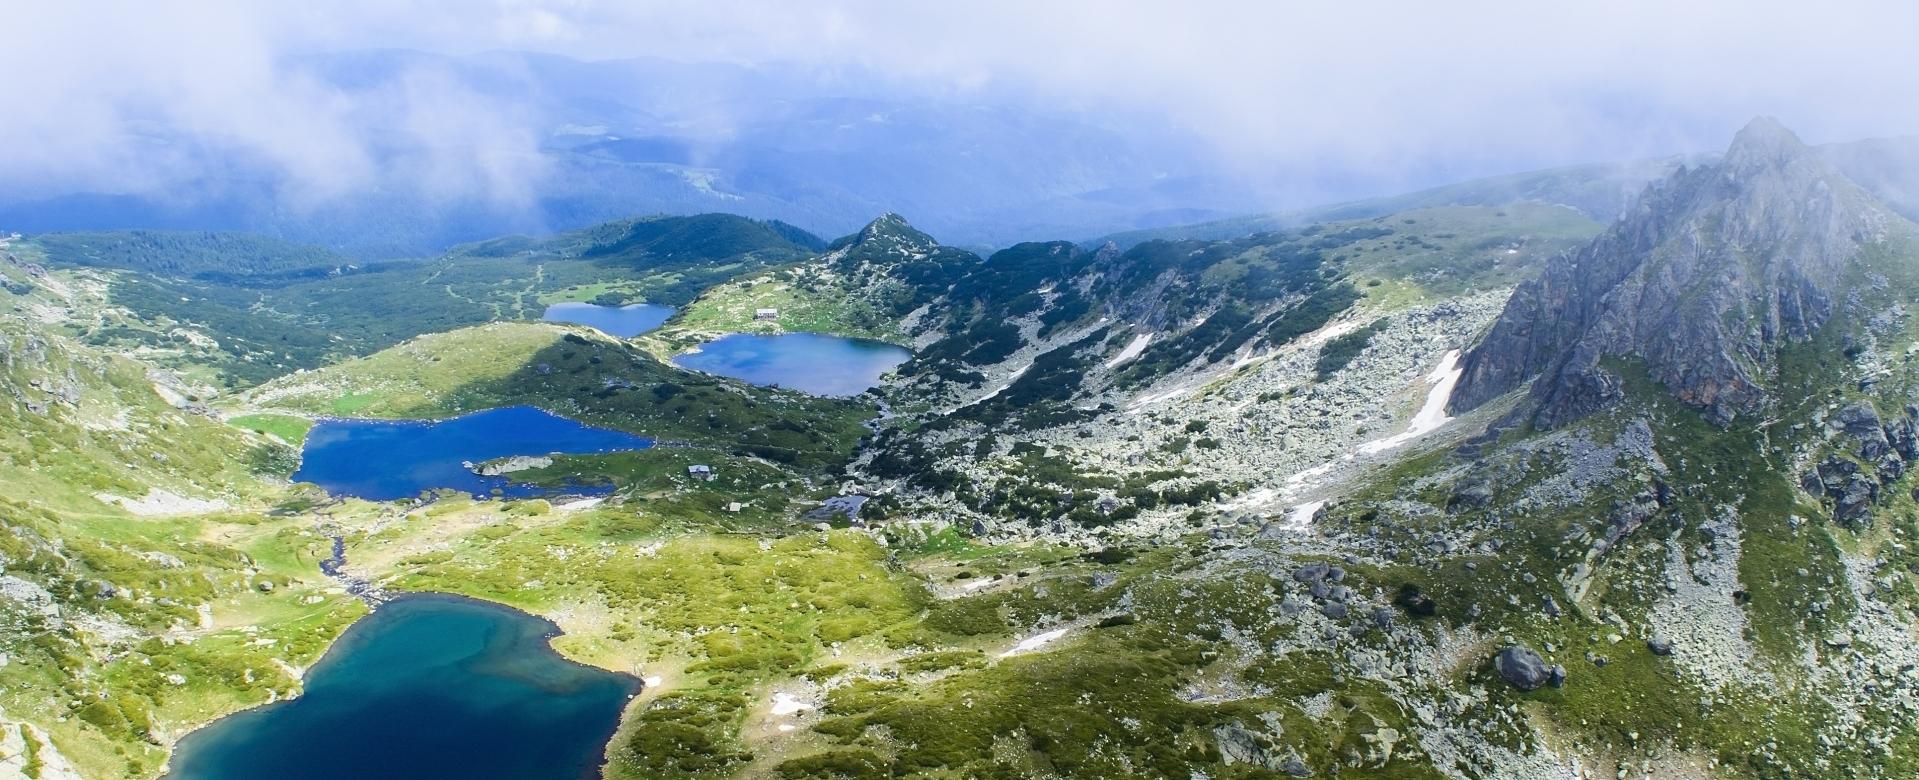 Voyage à pied : Traversée bulgare, de rila à pirin